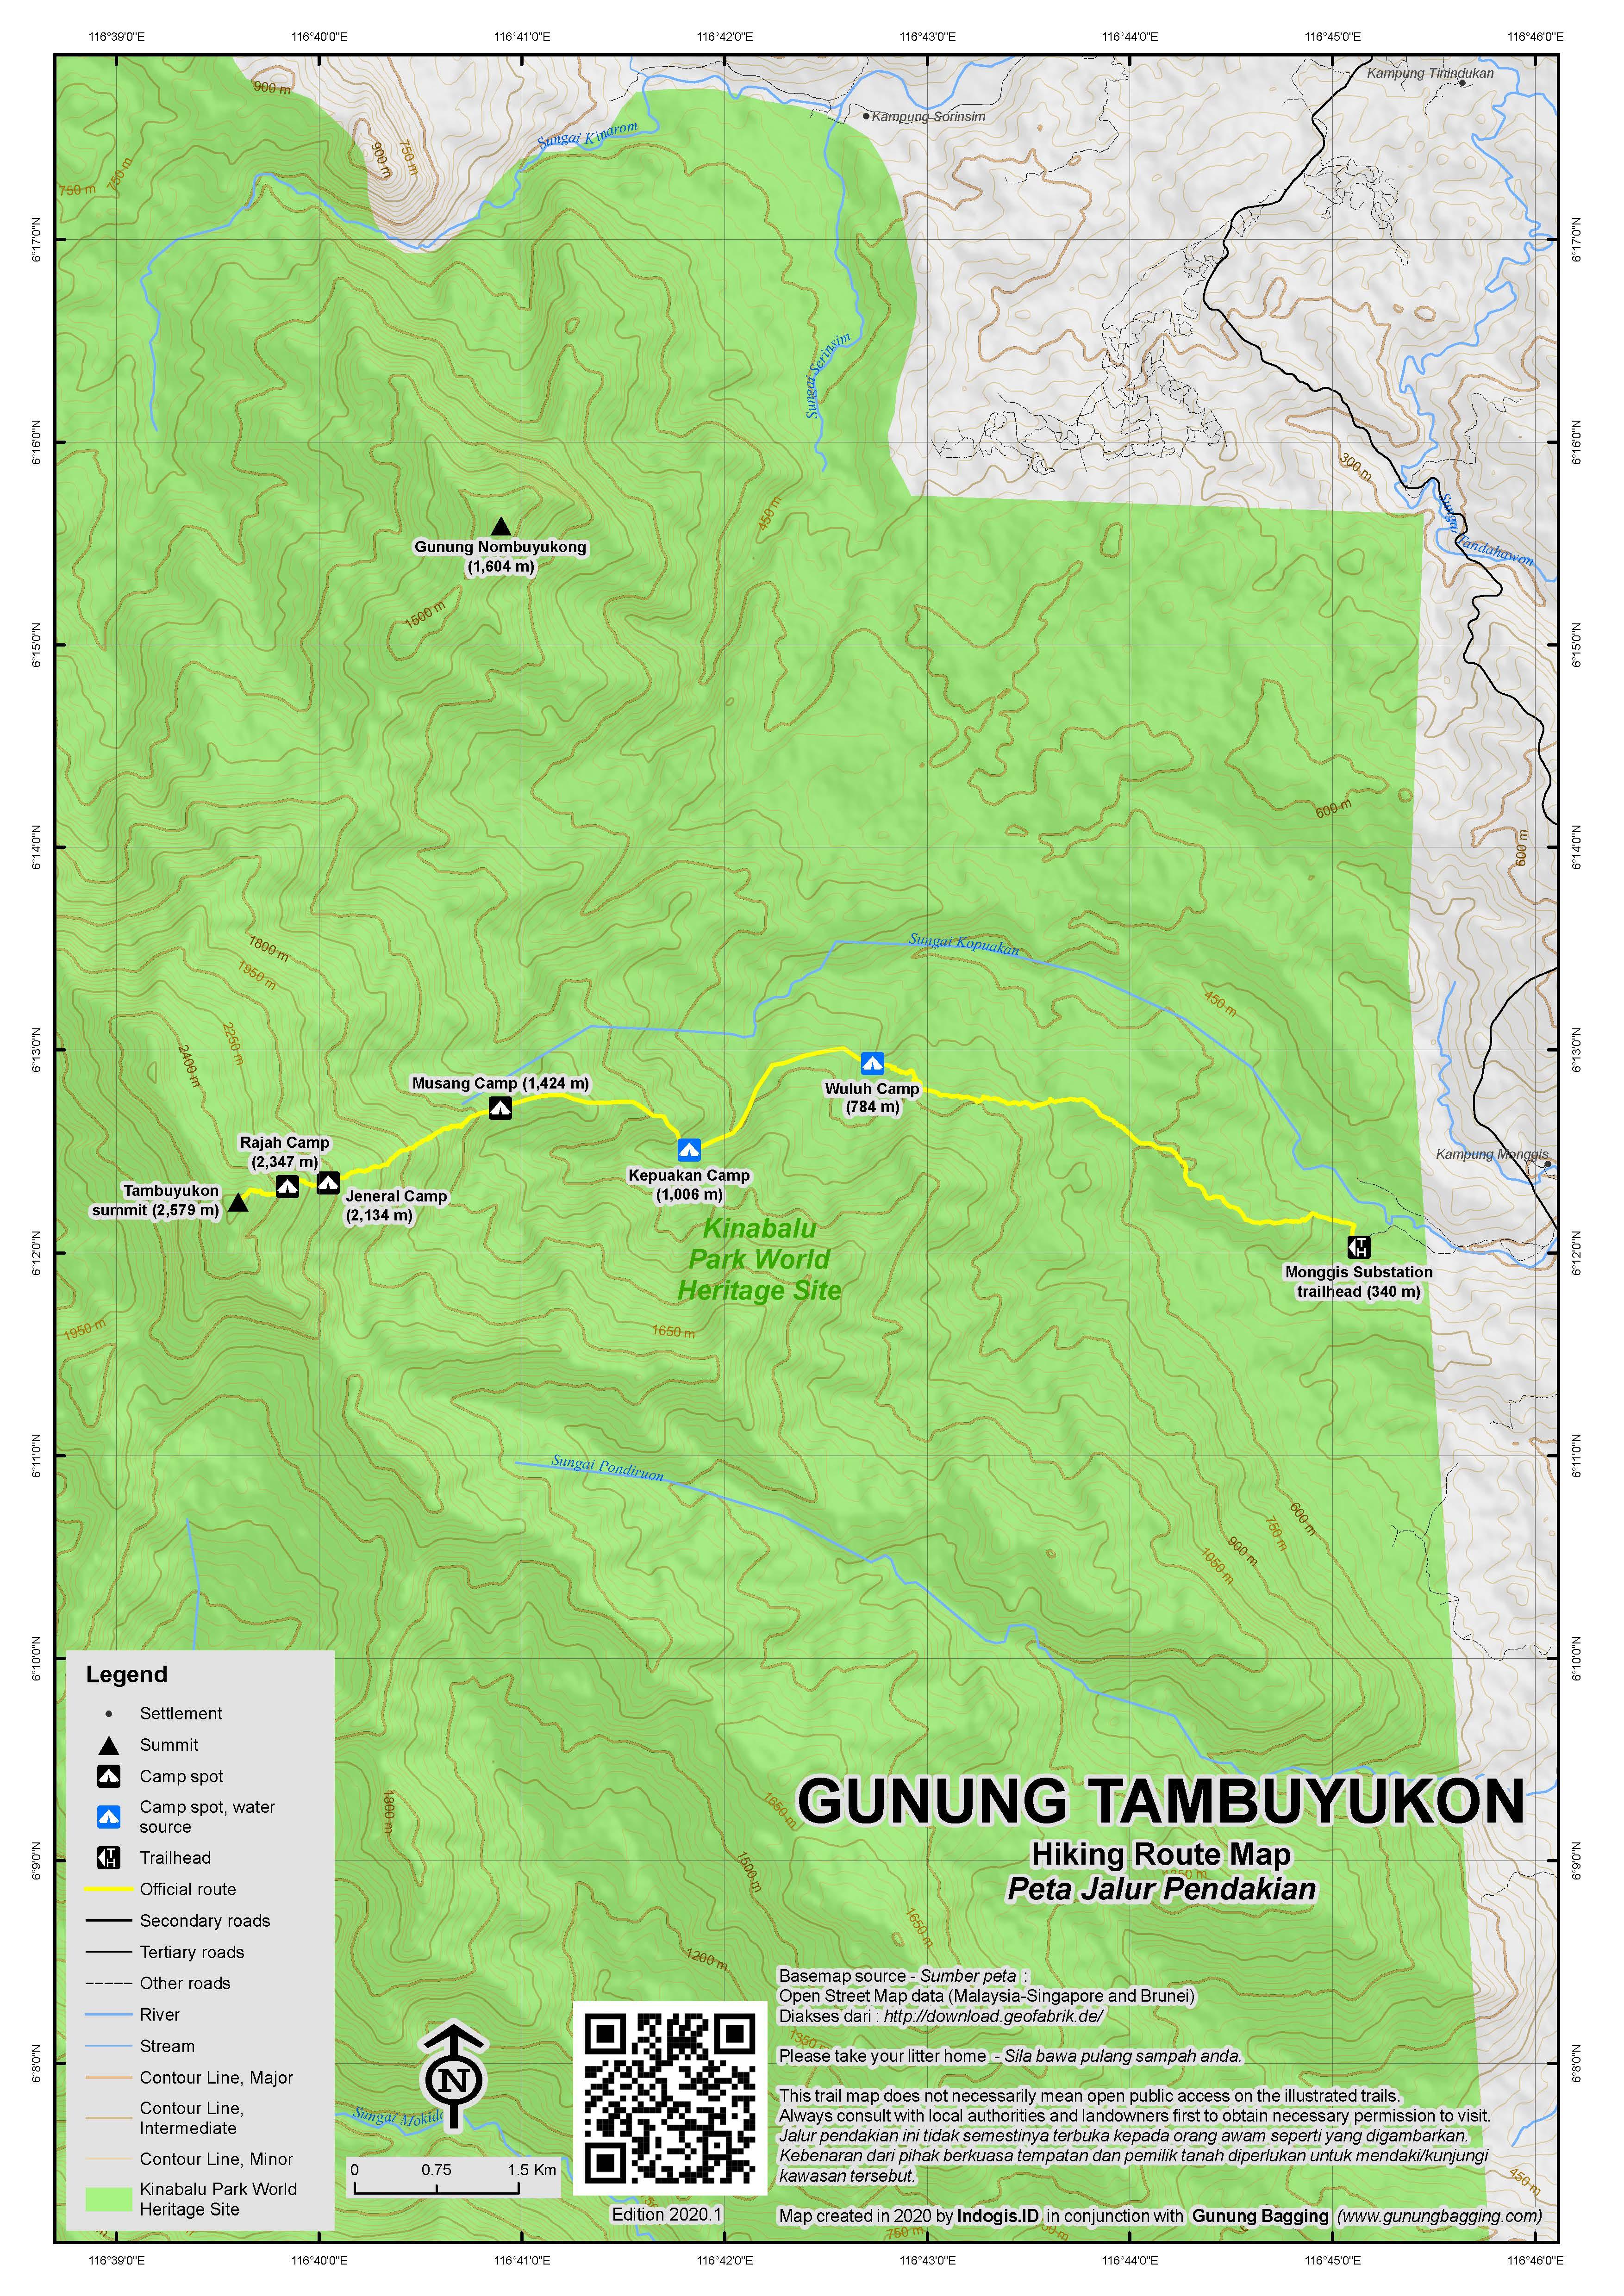 Peta Jalur Pendakian Gunung Tambuyukon